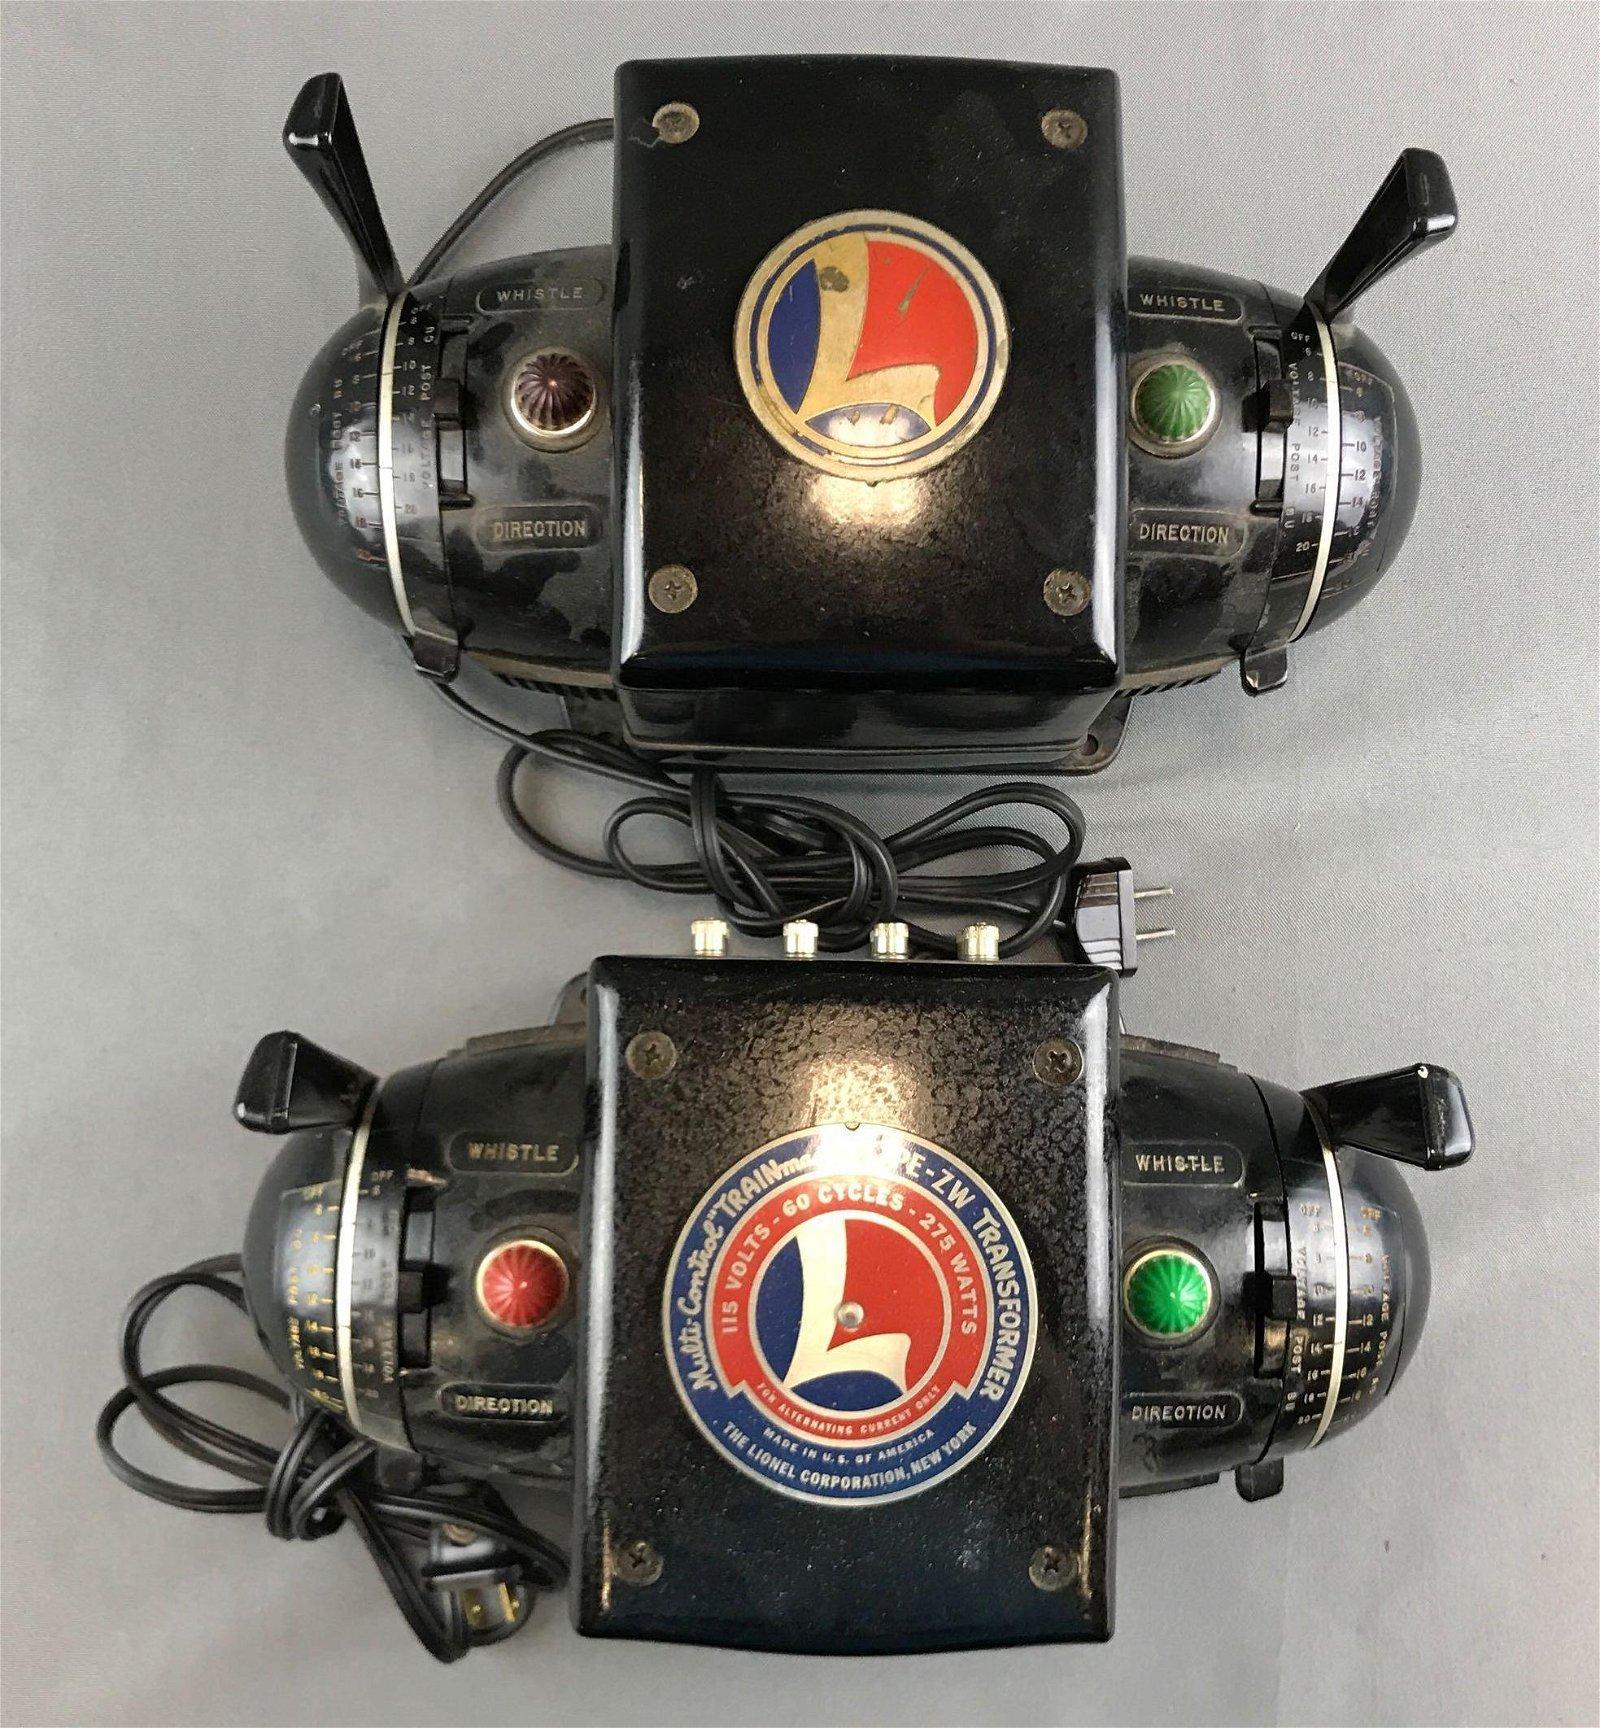 2 Lionel transformers